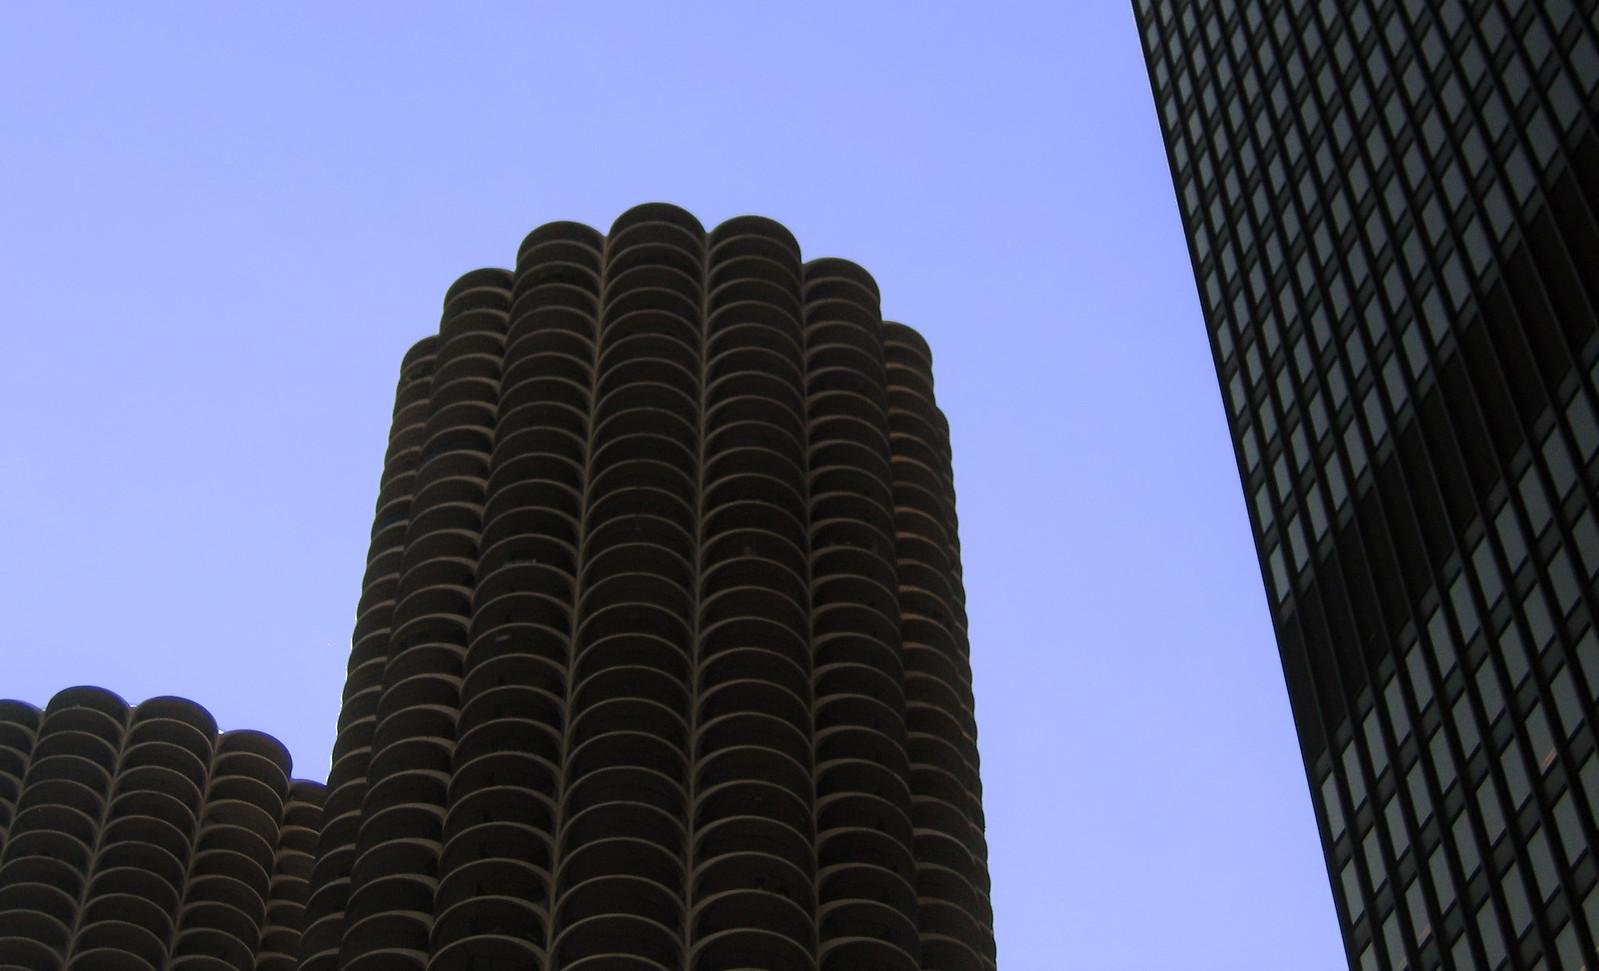 Chicago 0228